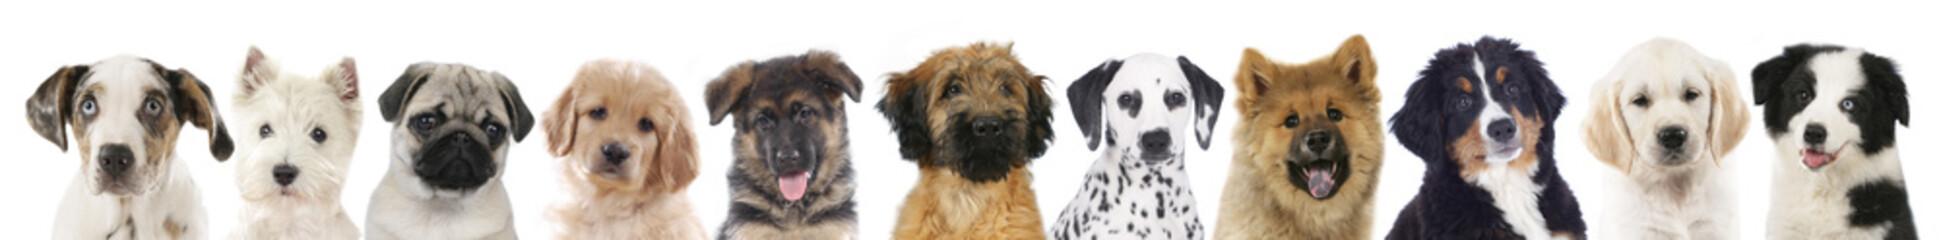 Verschiedene Welpen - Hunde Köpfe aufgereiht